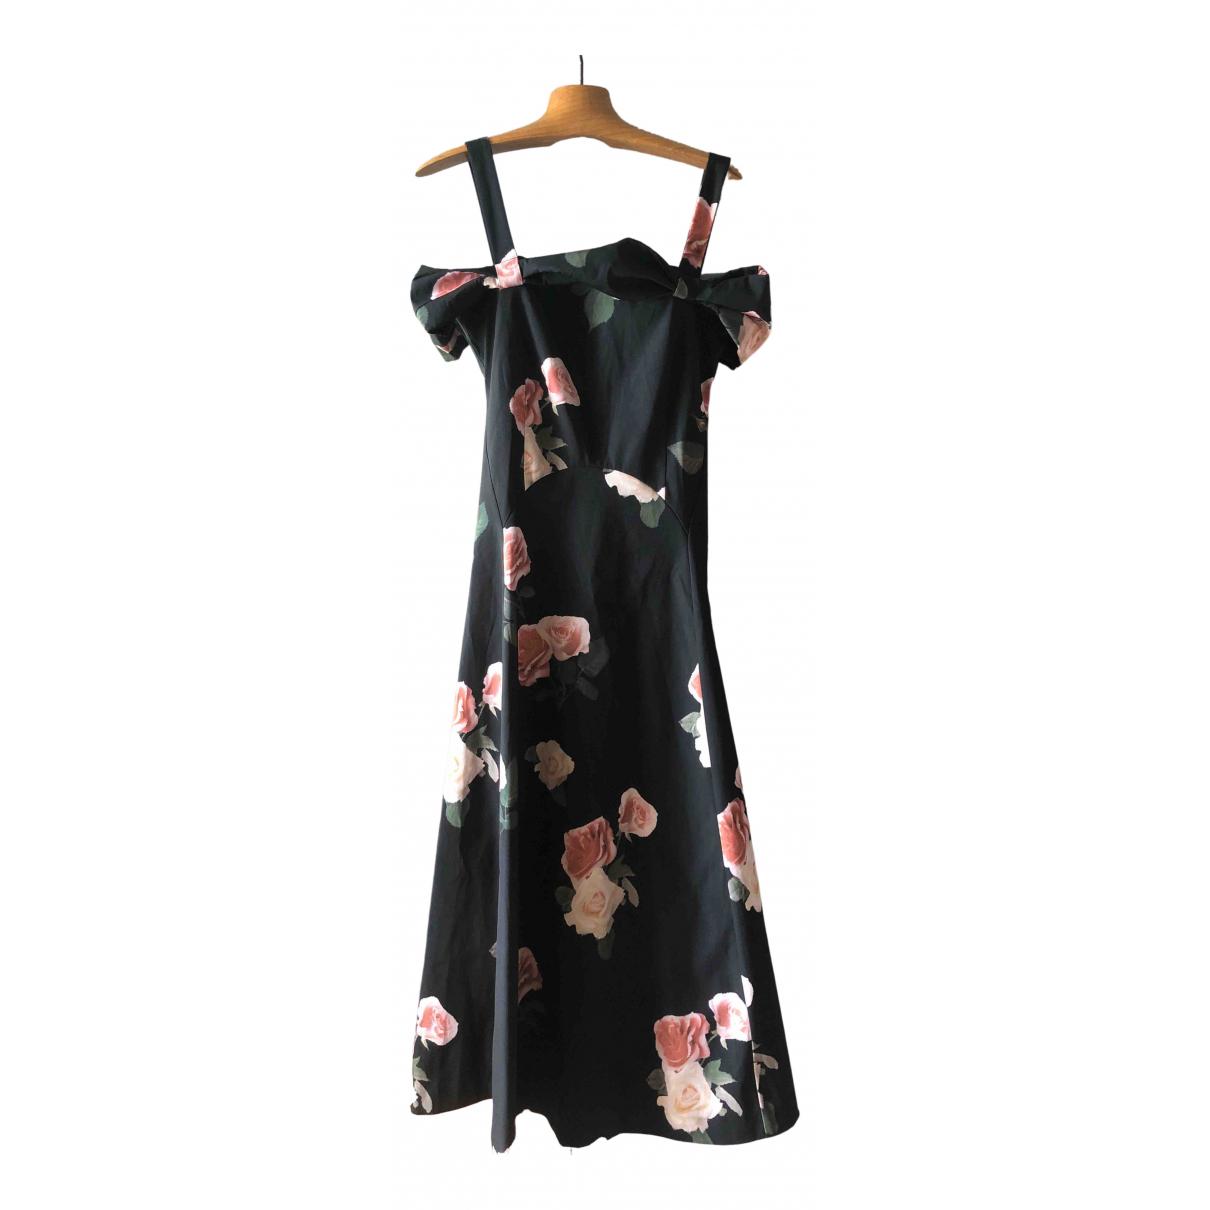 Rejina Pyo \N Kleid in  Schwarz Polyester